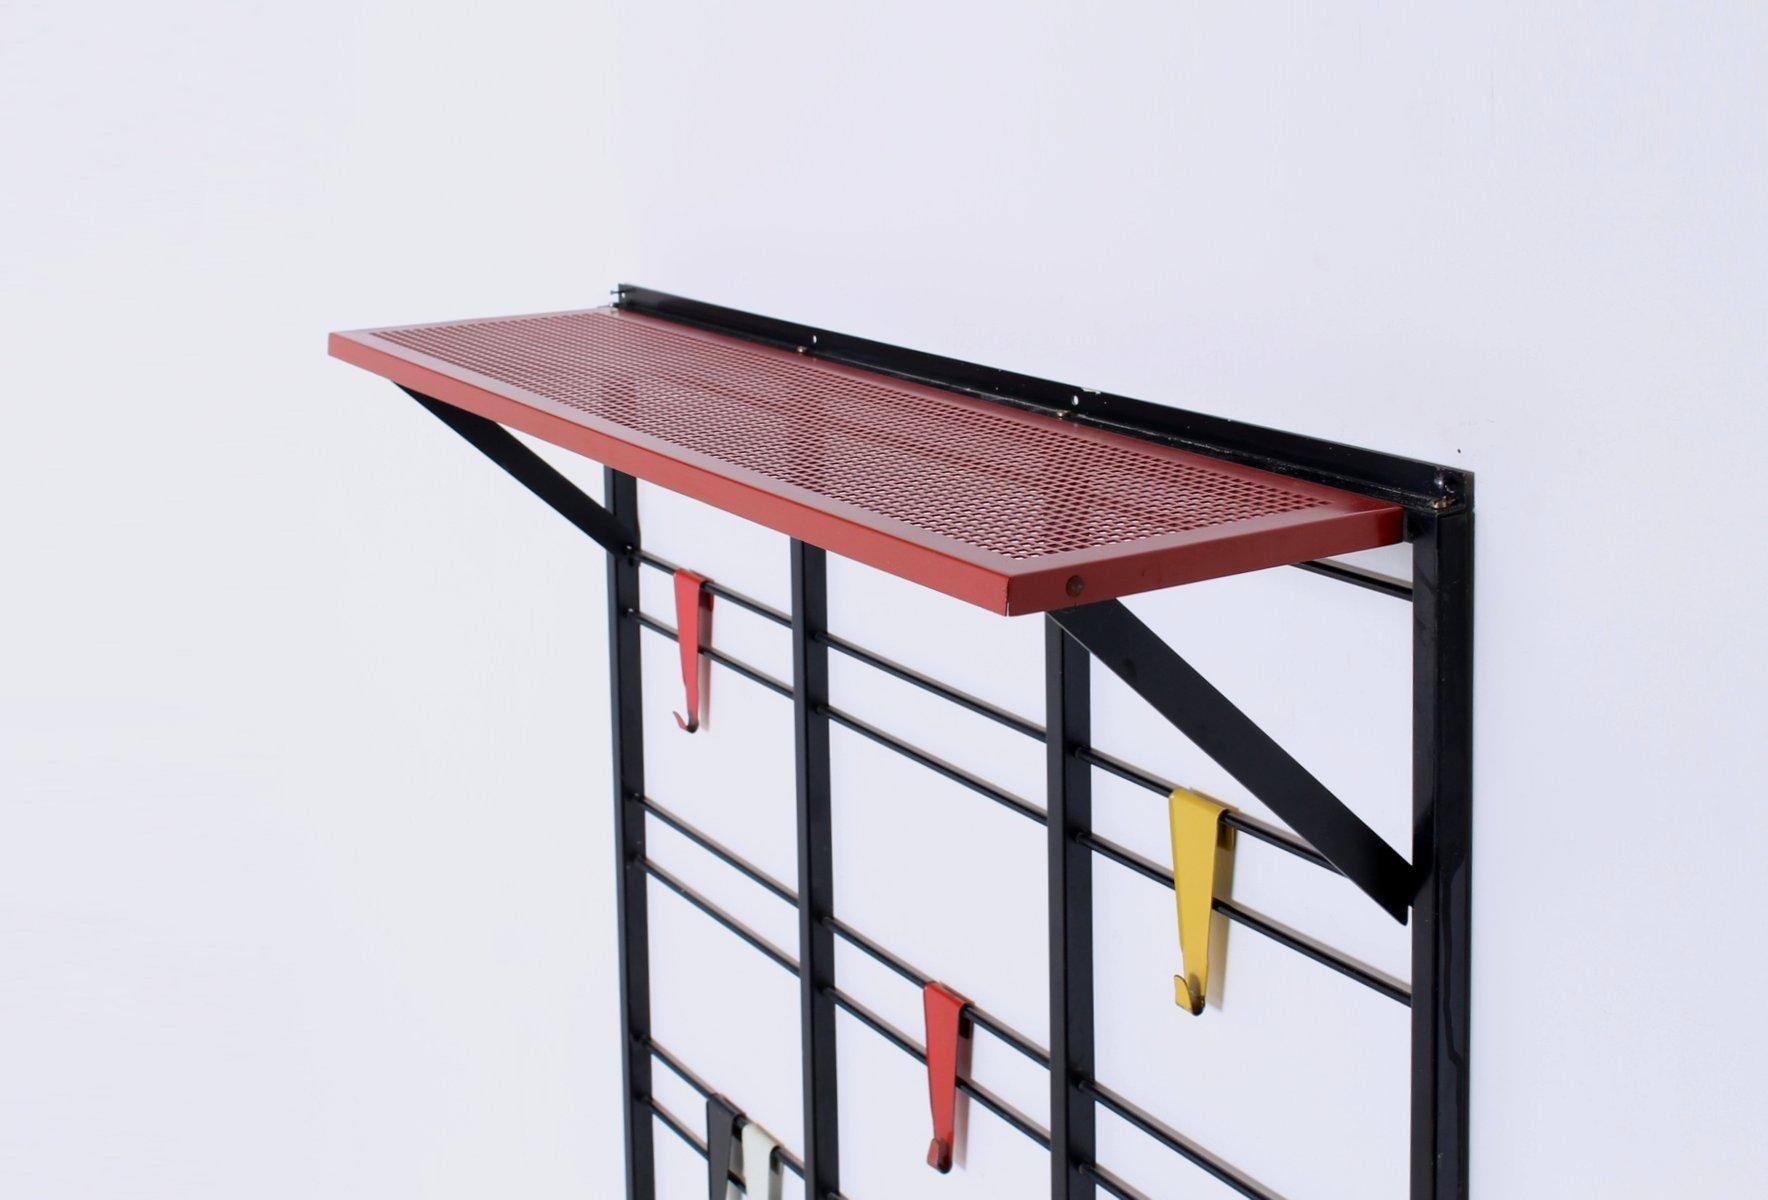 servo muto garderobe aus metall von tjerk reijenga f r. Black Bedroom Furniture Sets. Home Design Ideas